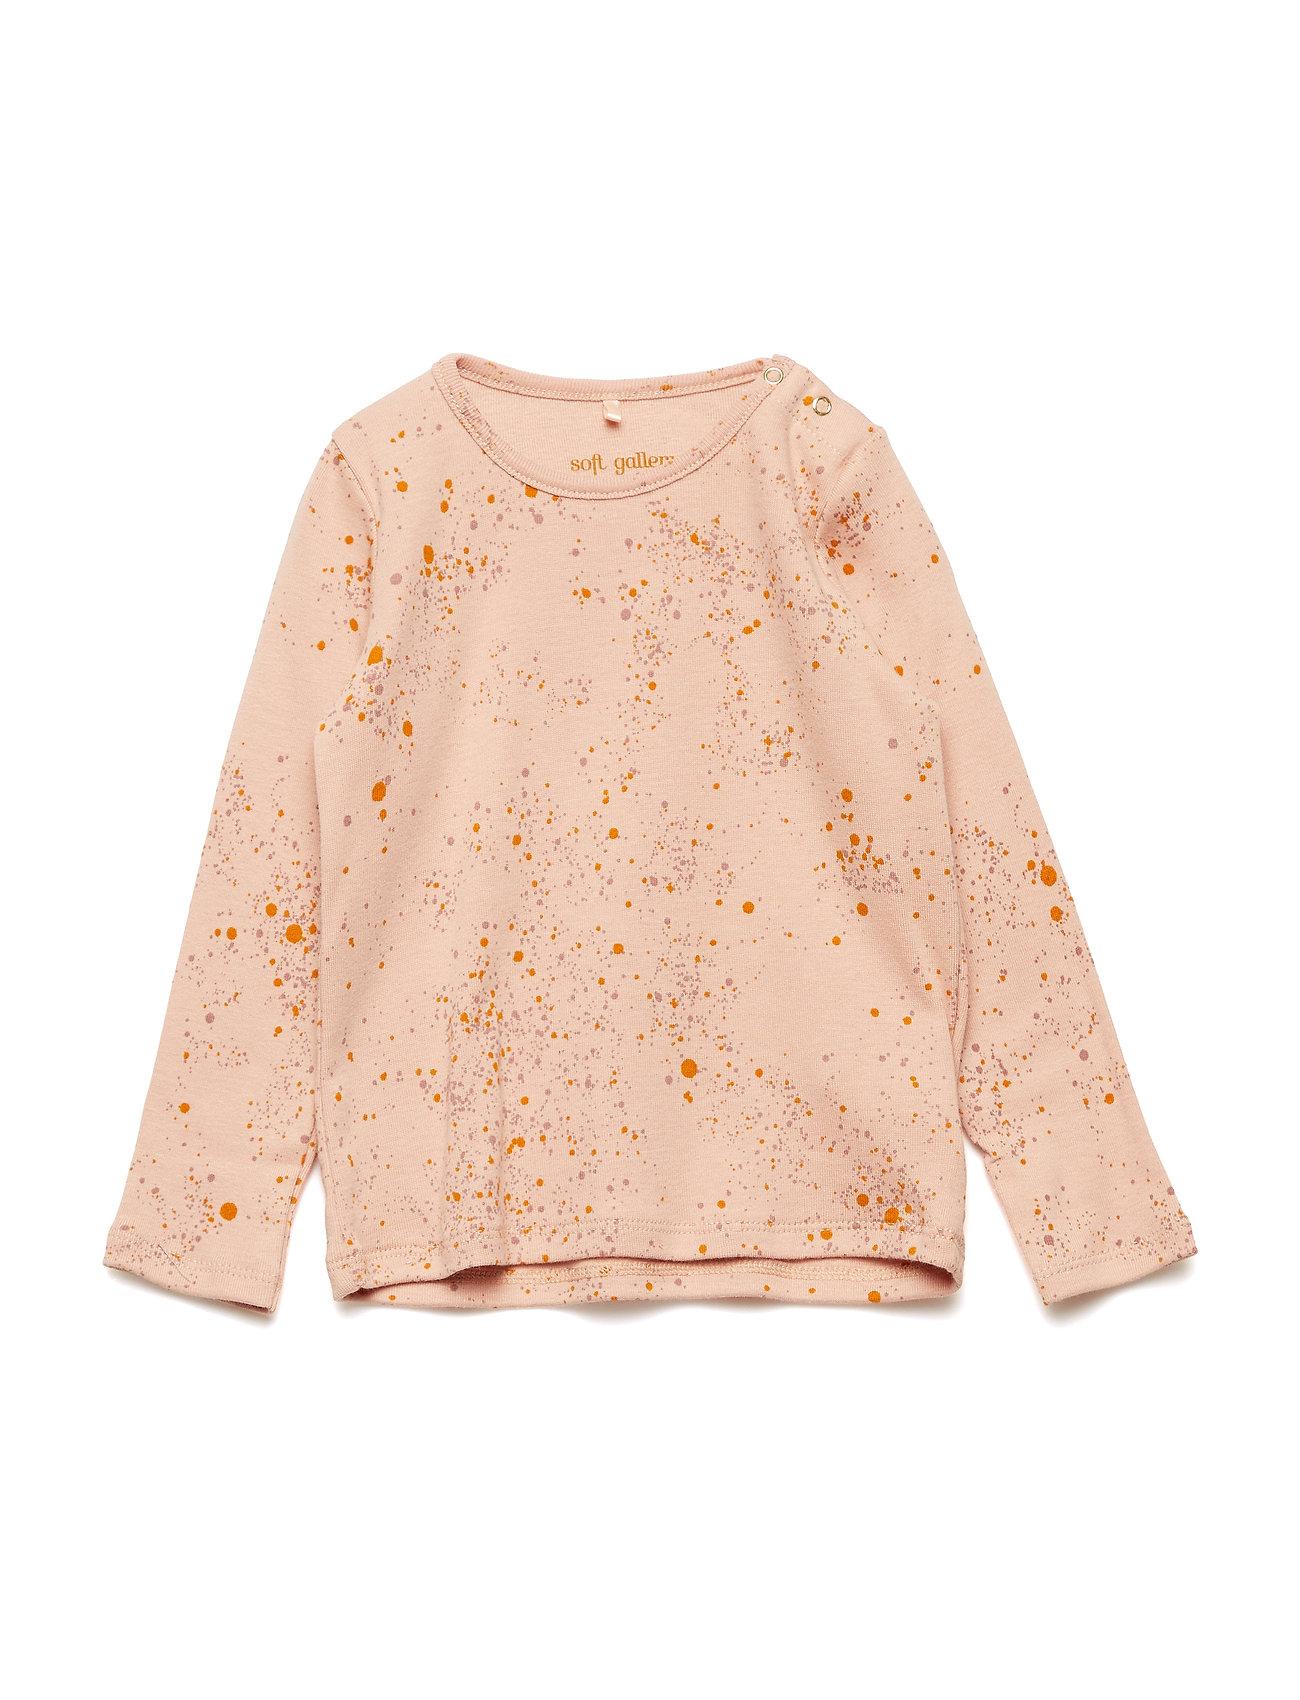 Soft Gallery Baby Bella T-shirt - PEACH PERFECT, AOP MINI SPLASH ROSE